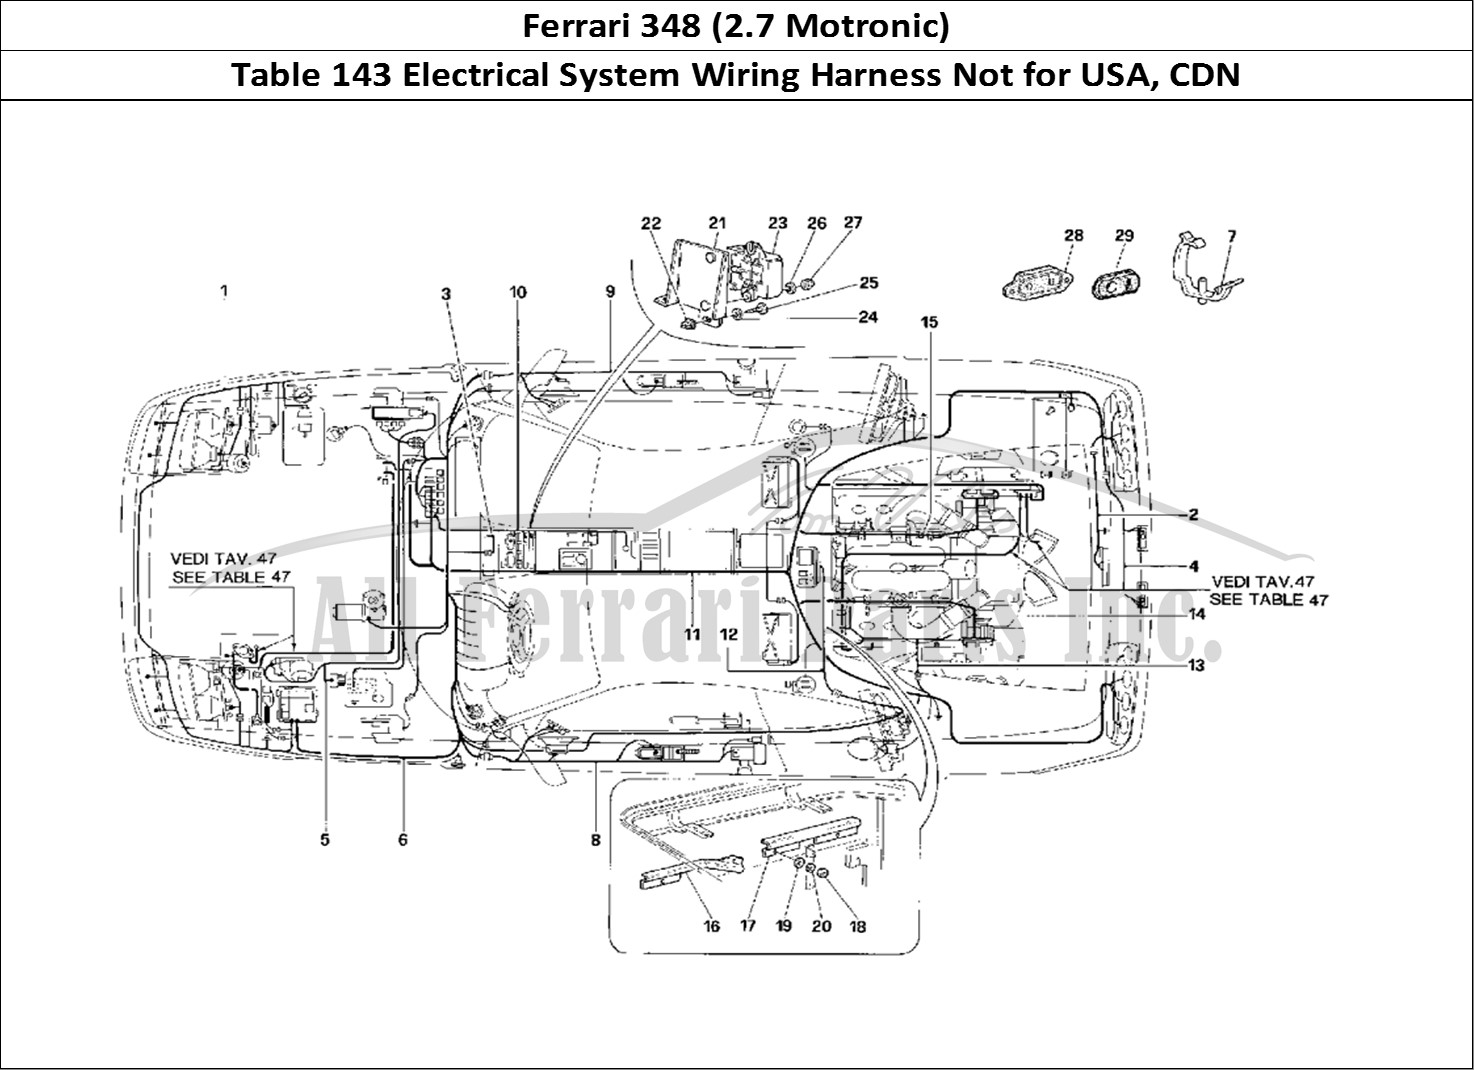 Buy Original Ferrari 348  2 7 Motronic  143 Electrical